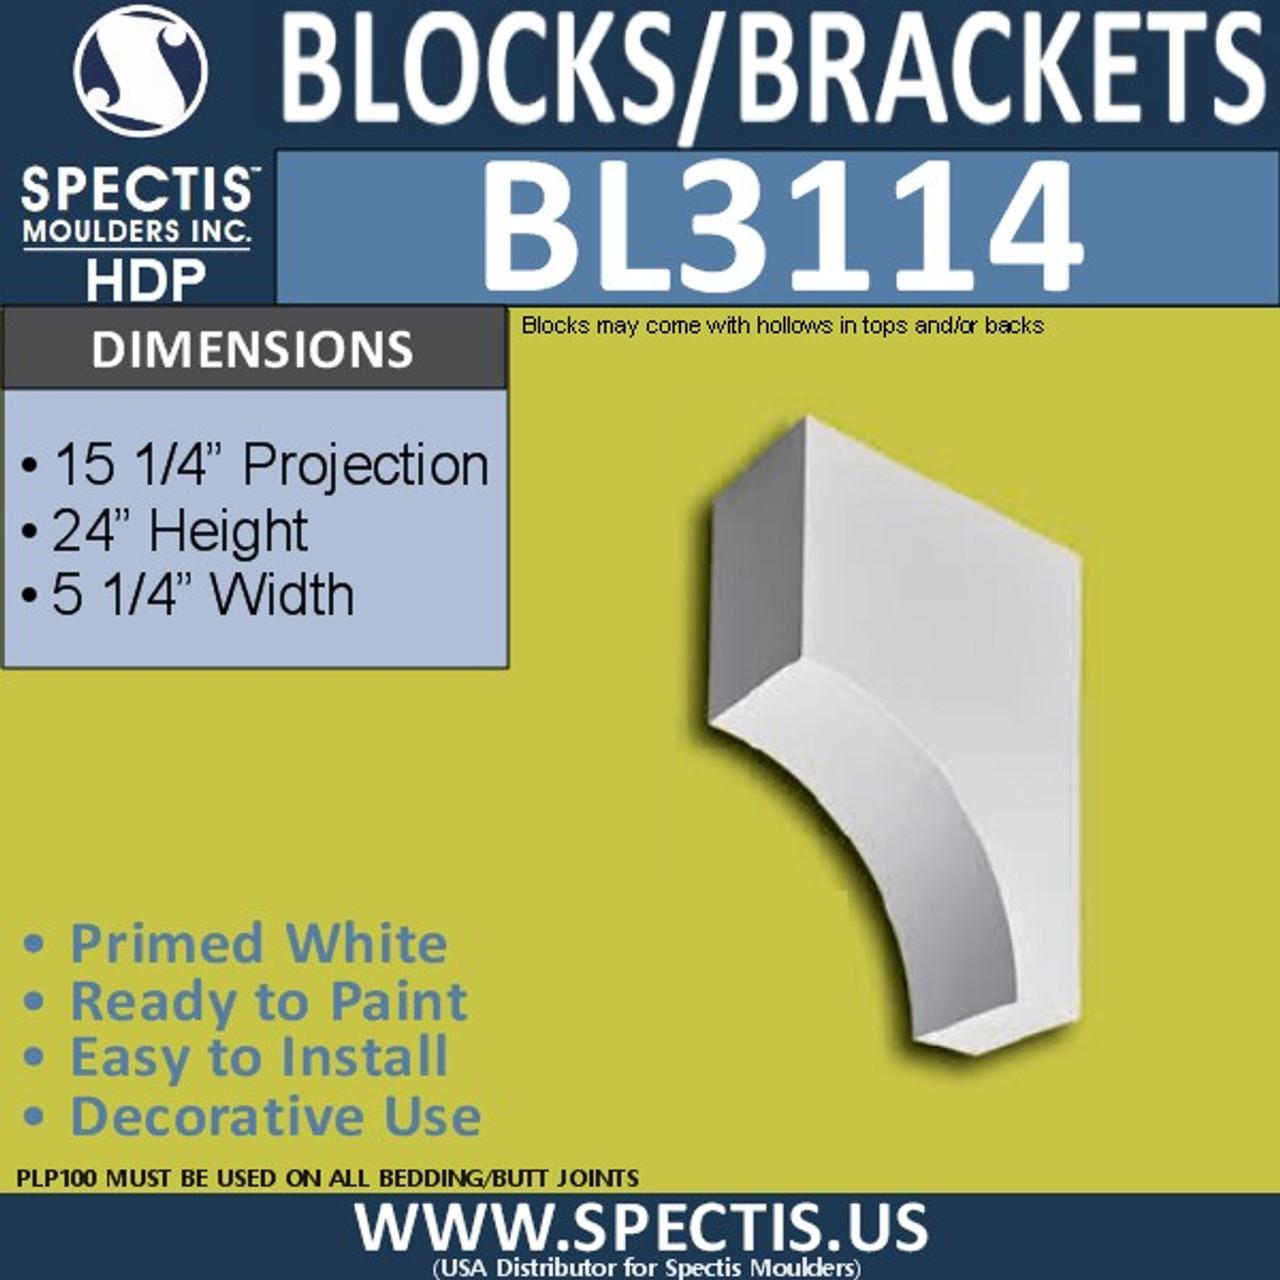 "BL3114 Eave Block or Bracket 5.25""W x 24""H x 15.25""P"